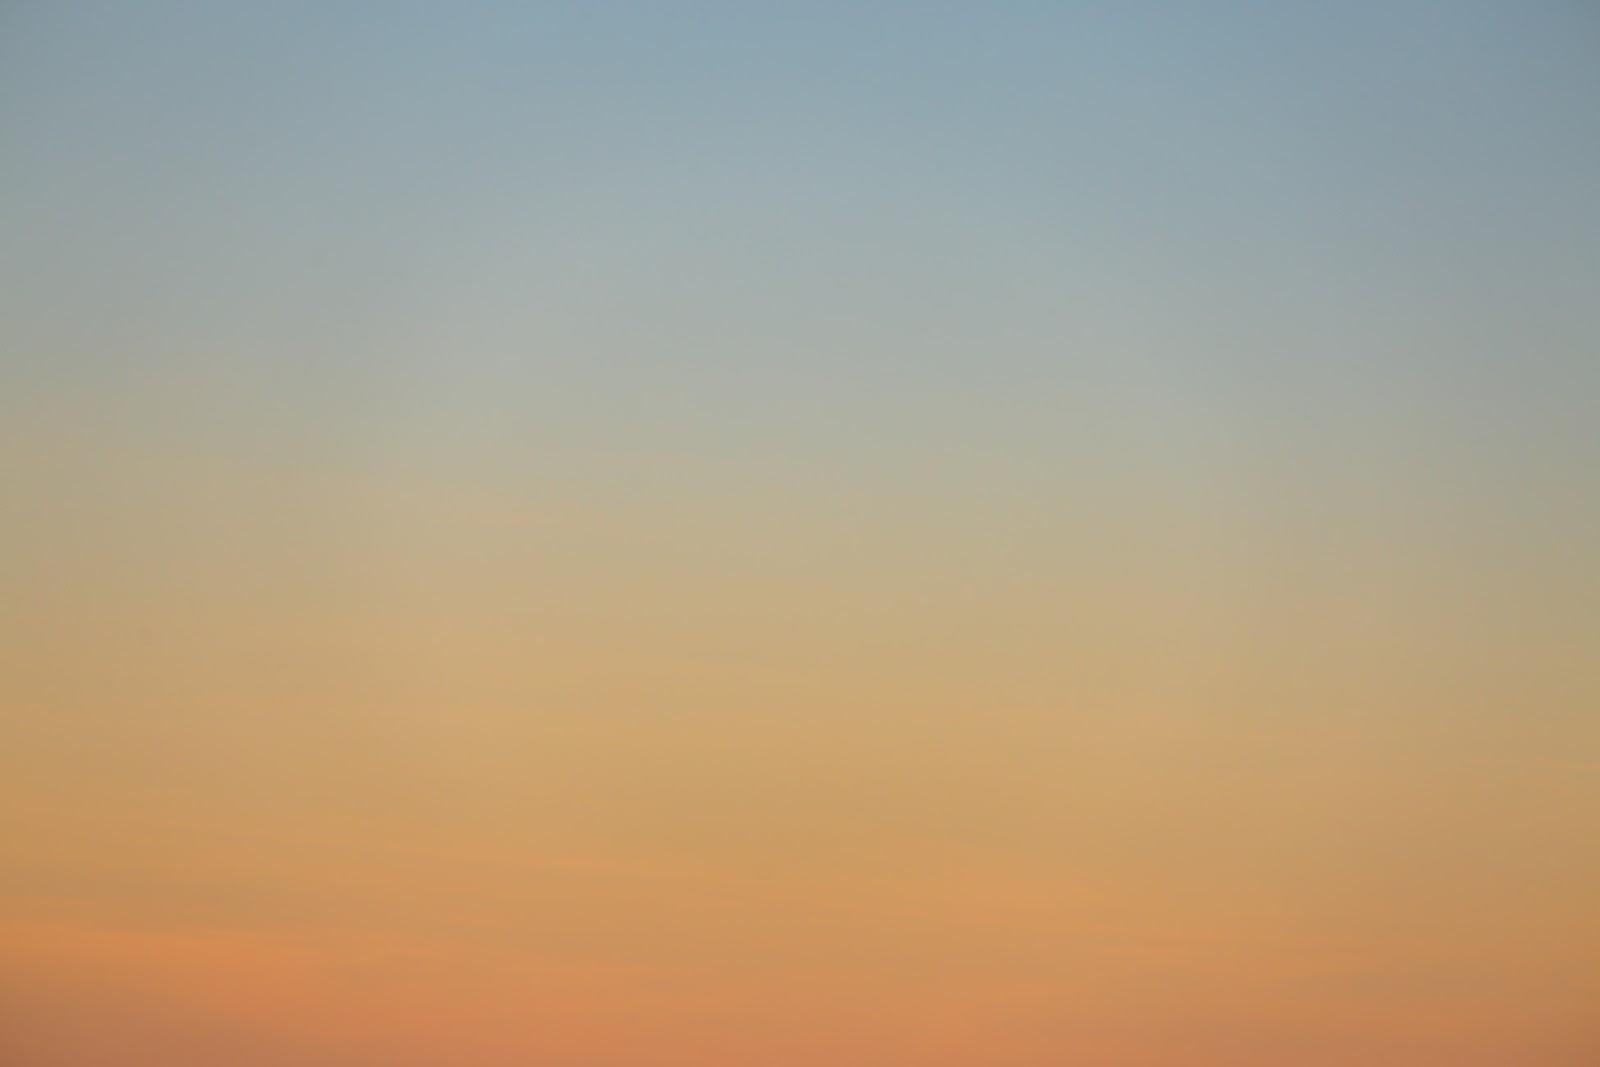 gradient linkedin background